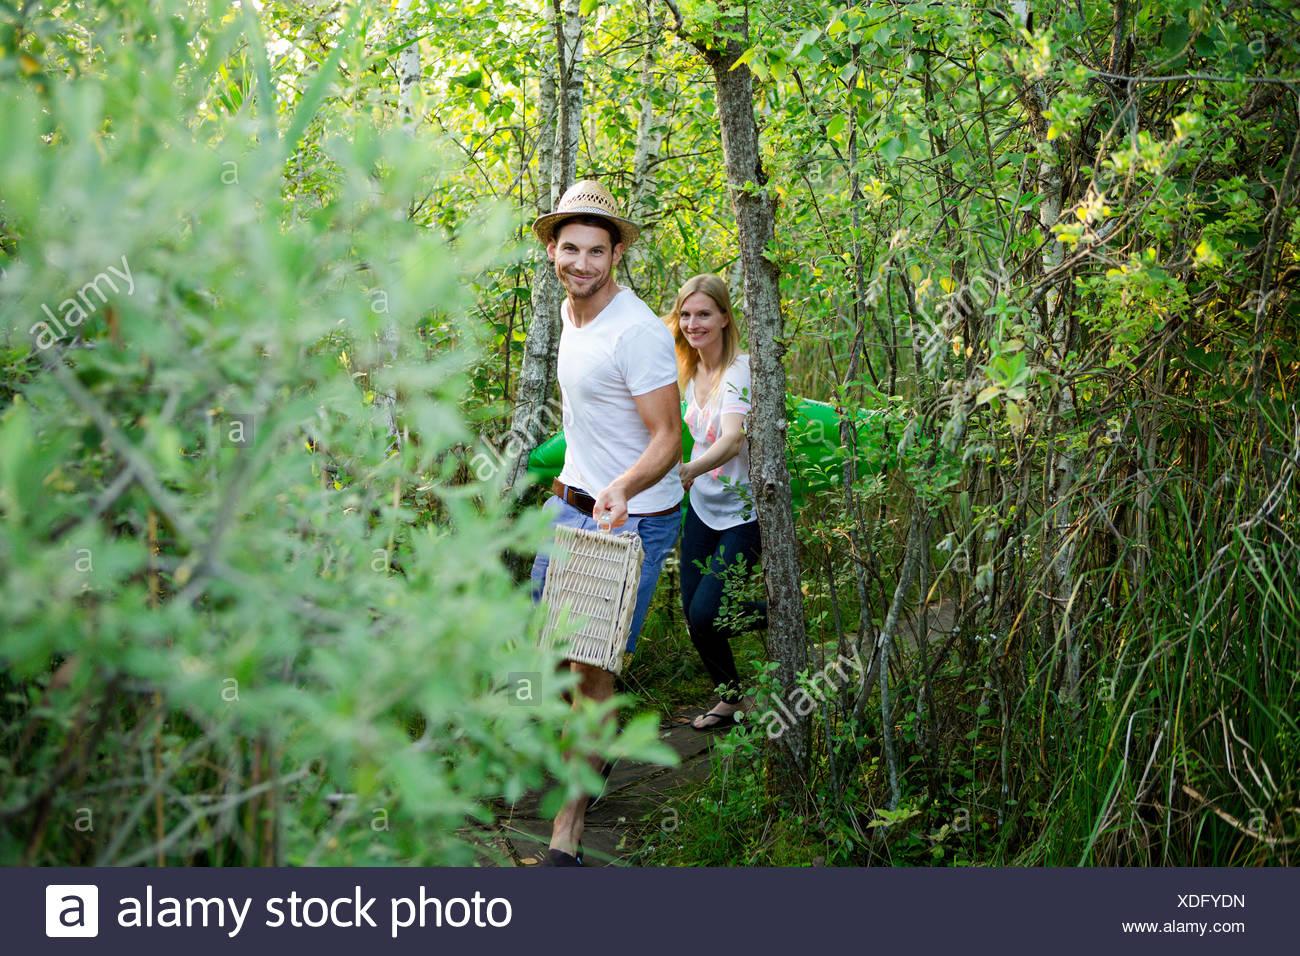 Mid adult couple walking through marshland with picnic basket - Stock Image